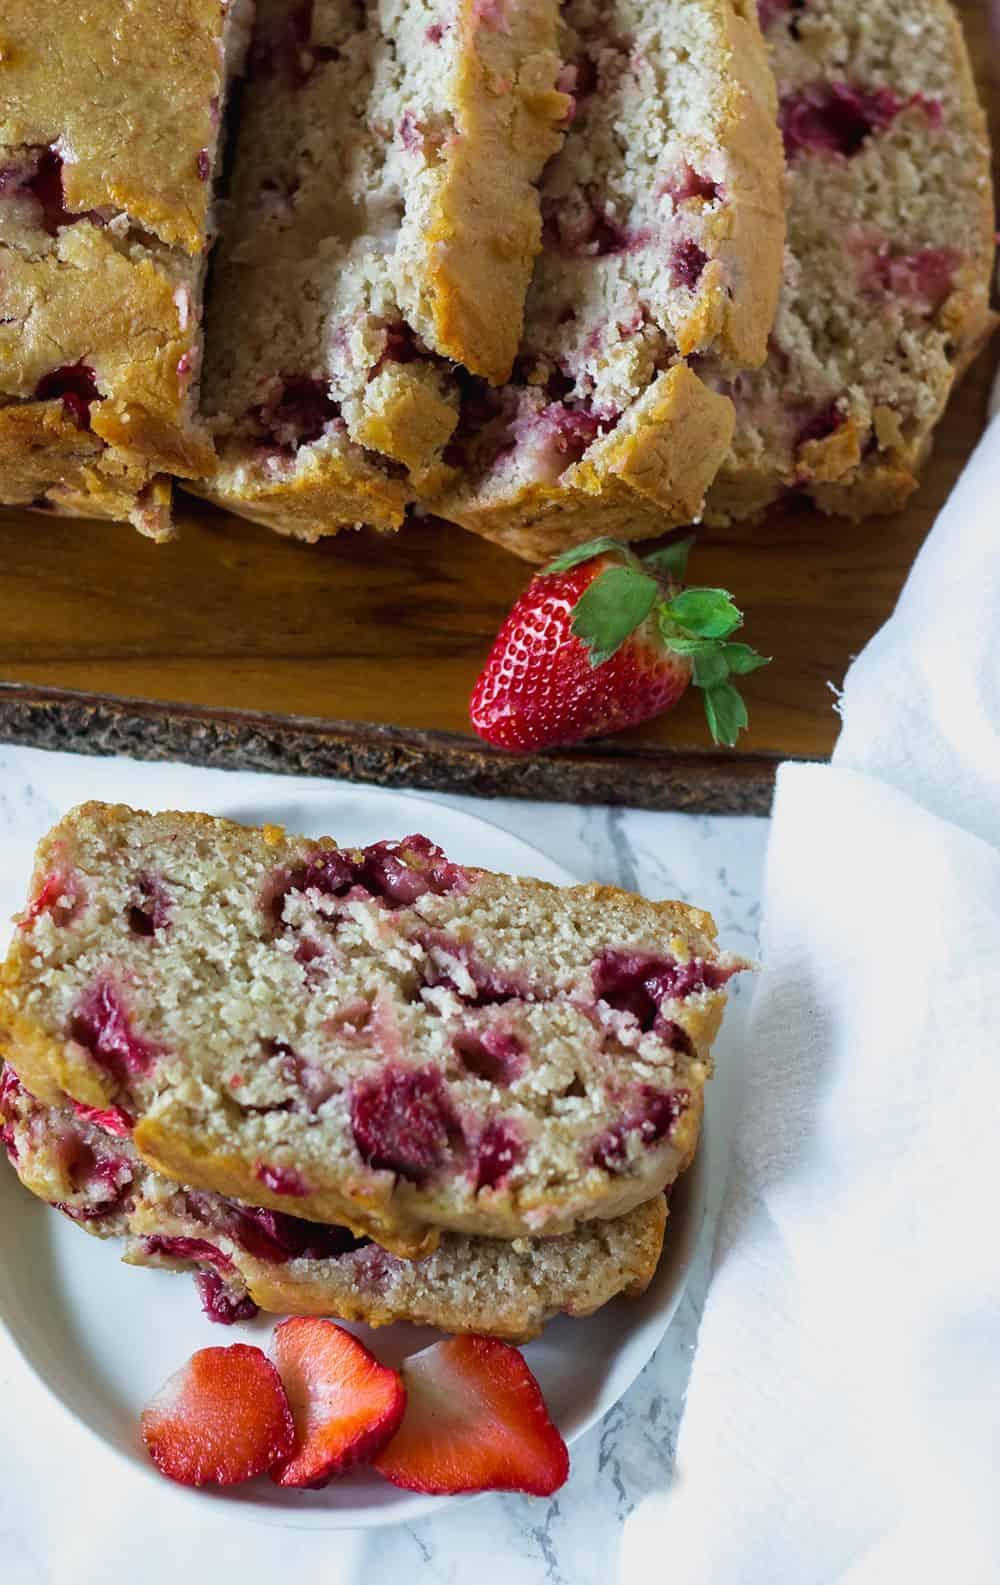 Strawberry Banana Bread (Vegan, Gluten-Free)